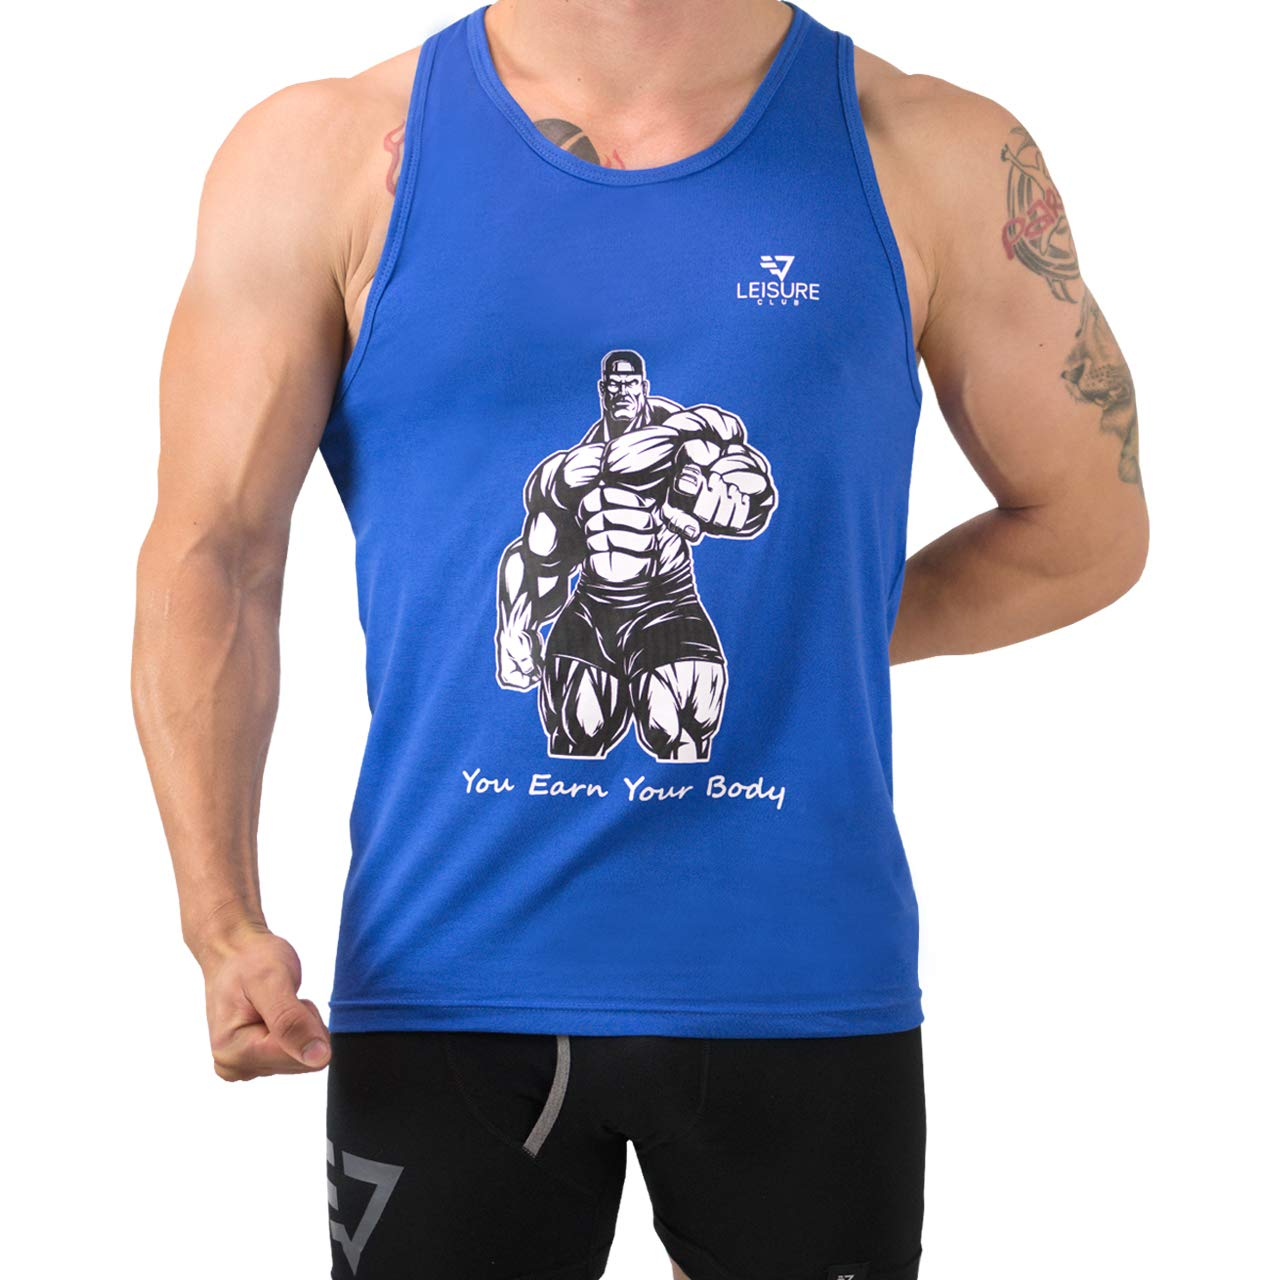 LEISURE CLUB Mens Athletic Vests Training Bodybuilding Gym Vests Motivational Sports Vest